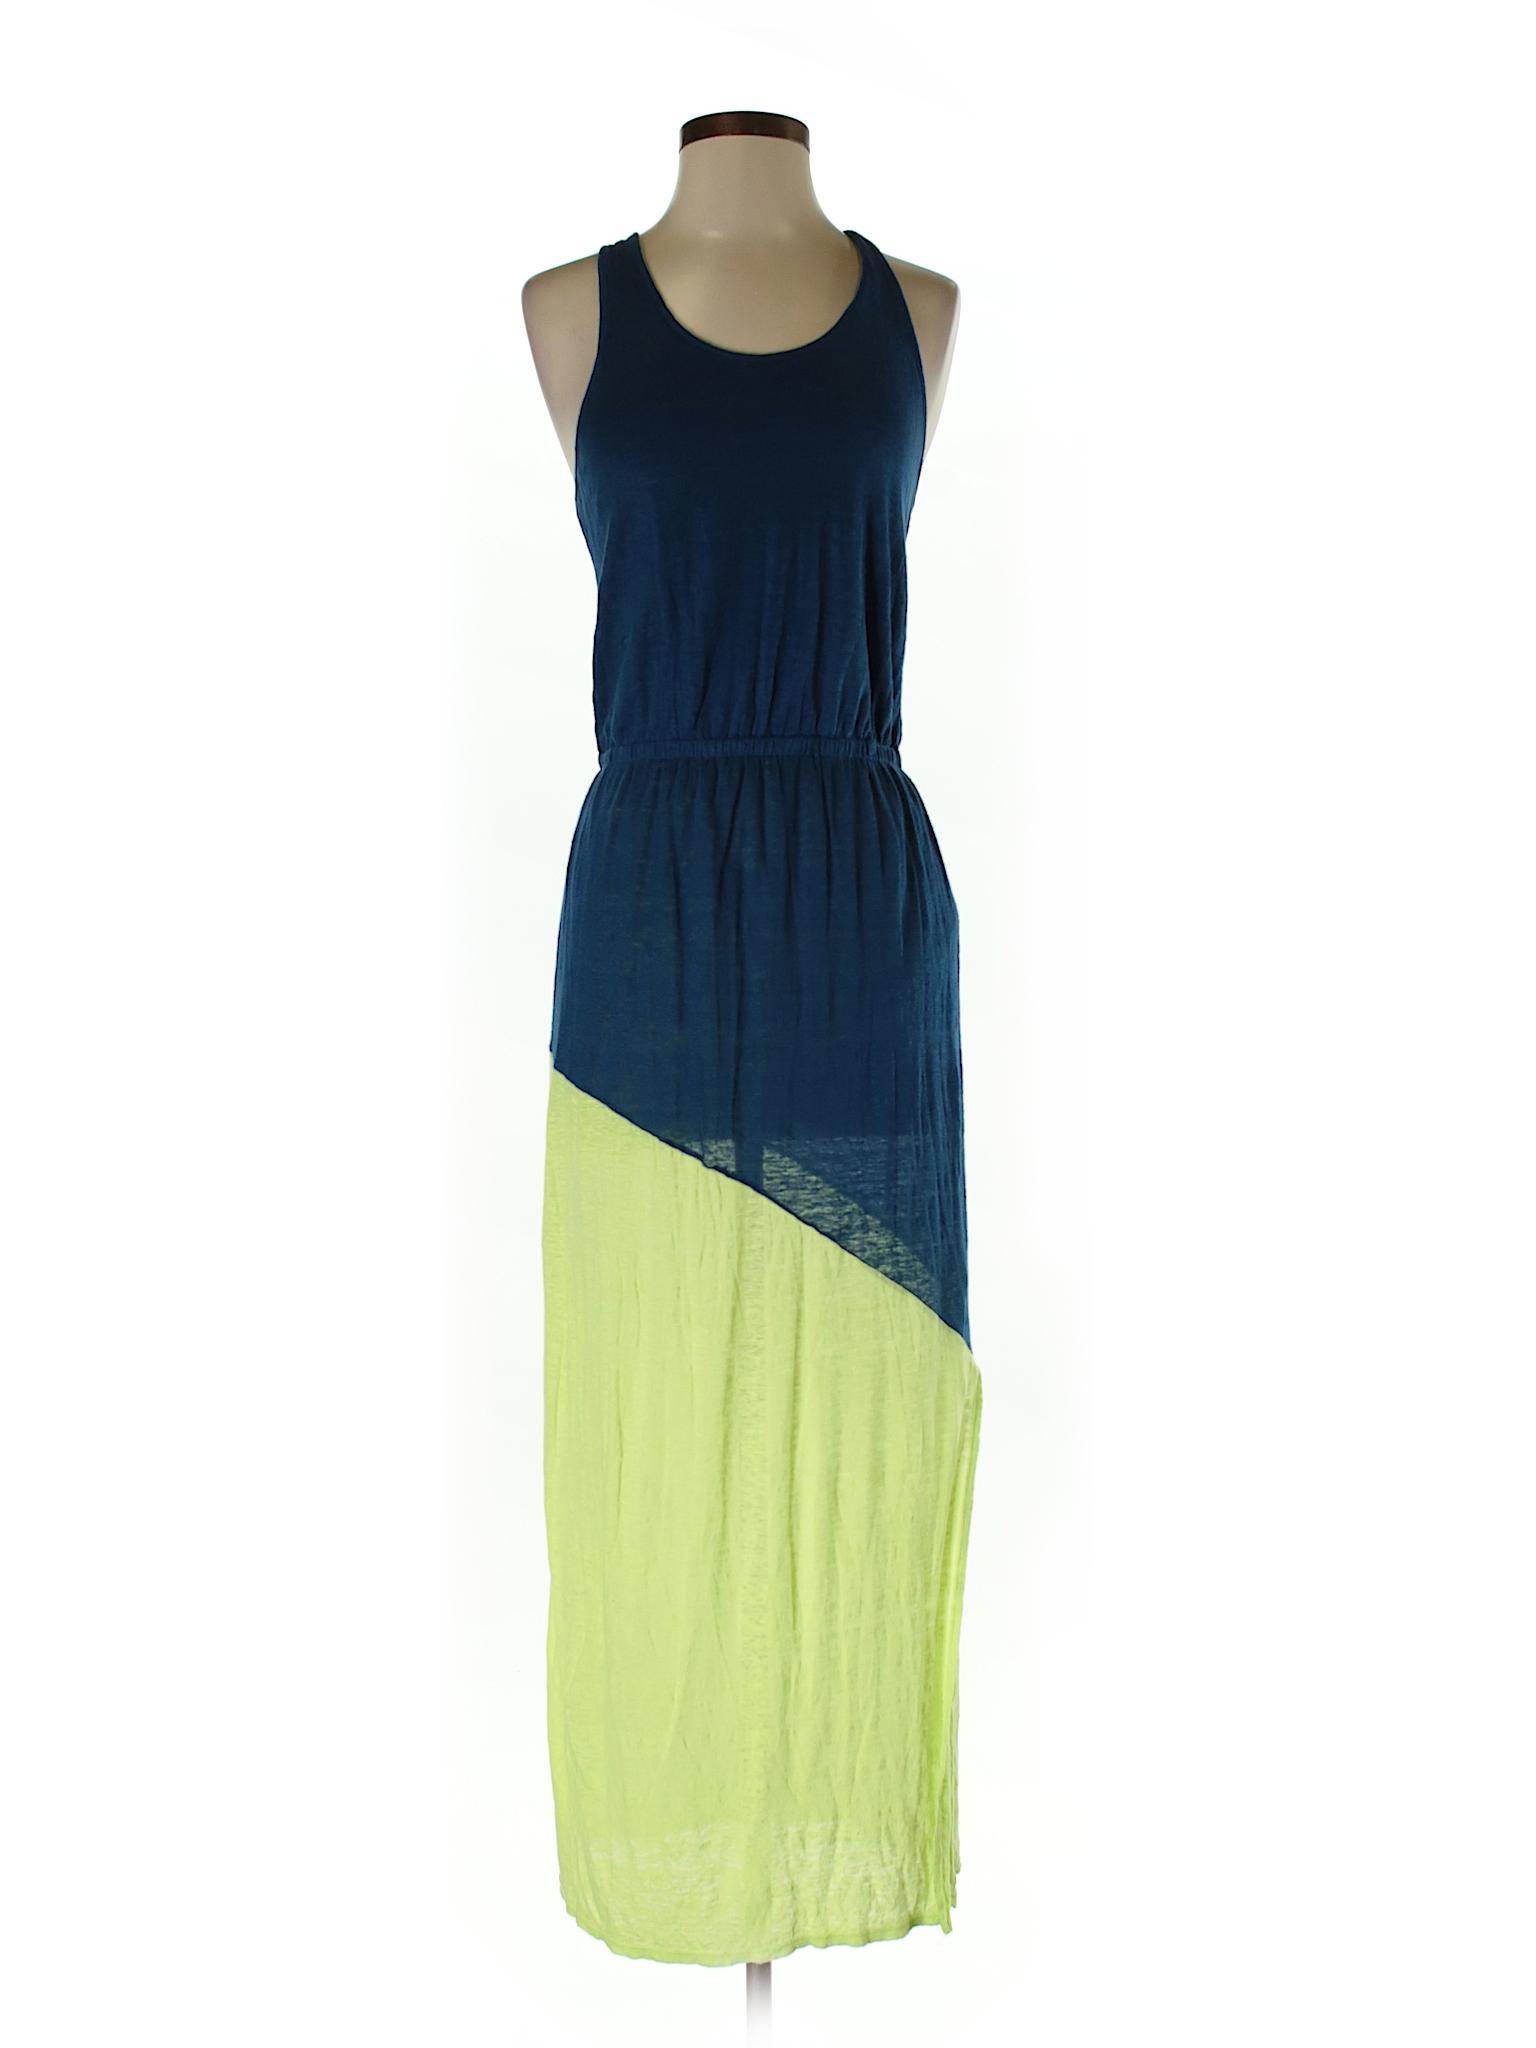 Casual amp;C C Dress Selling California pPT6wq